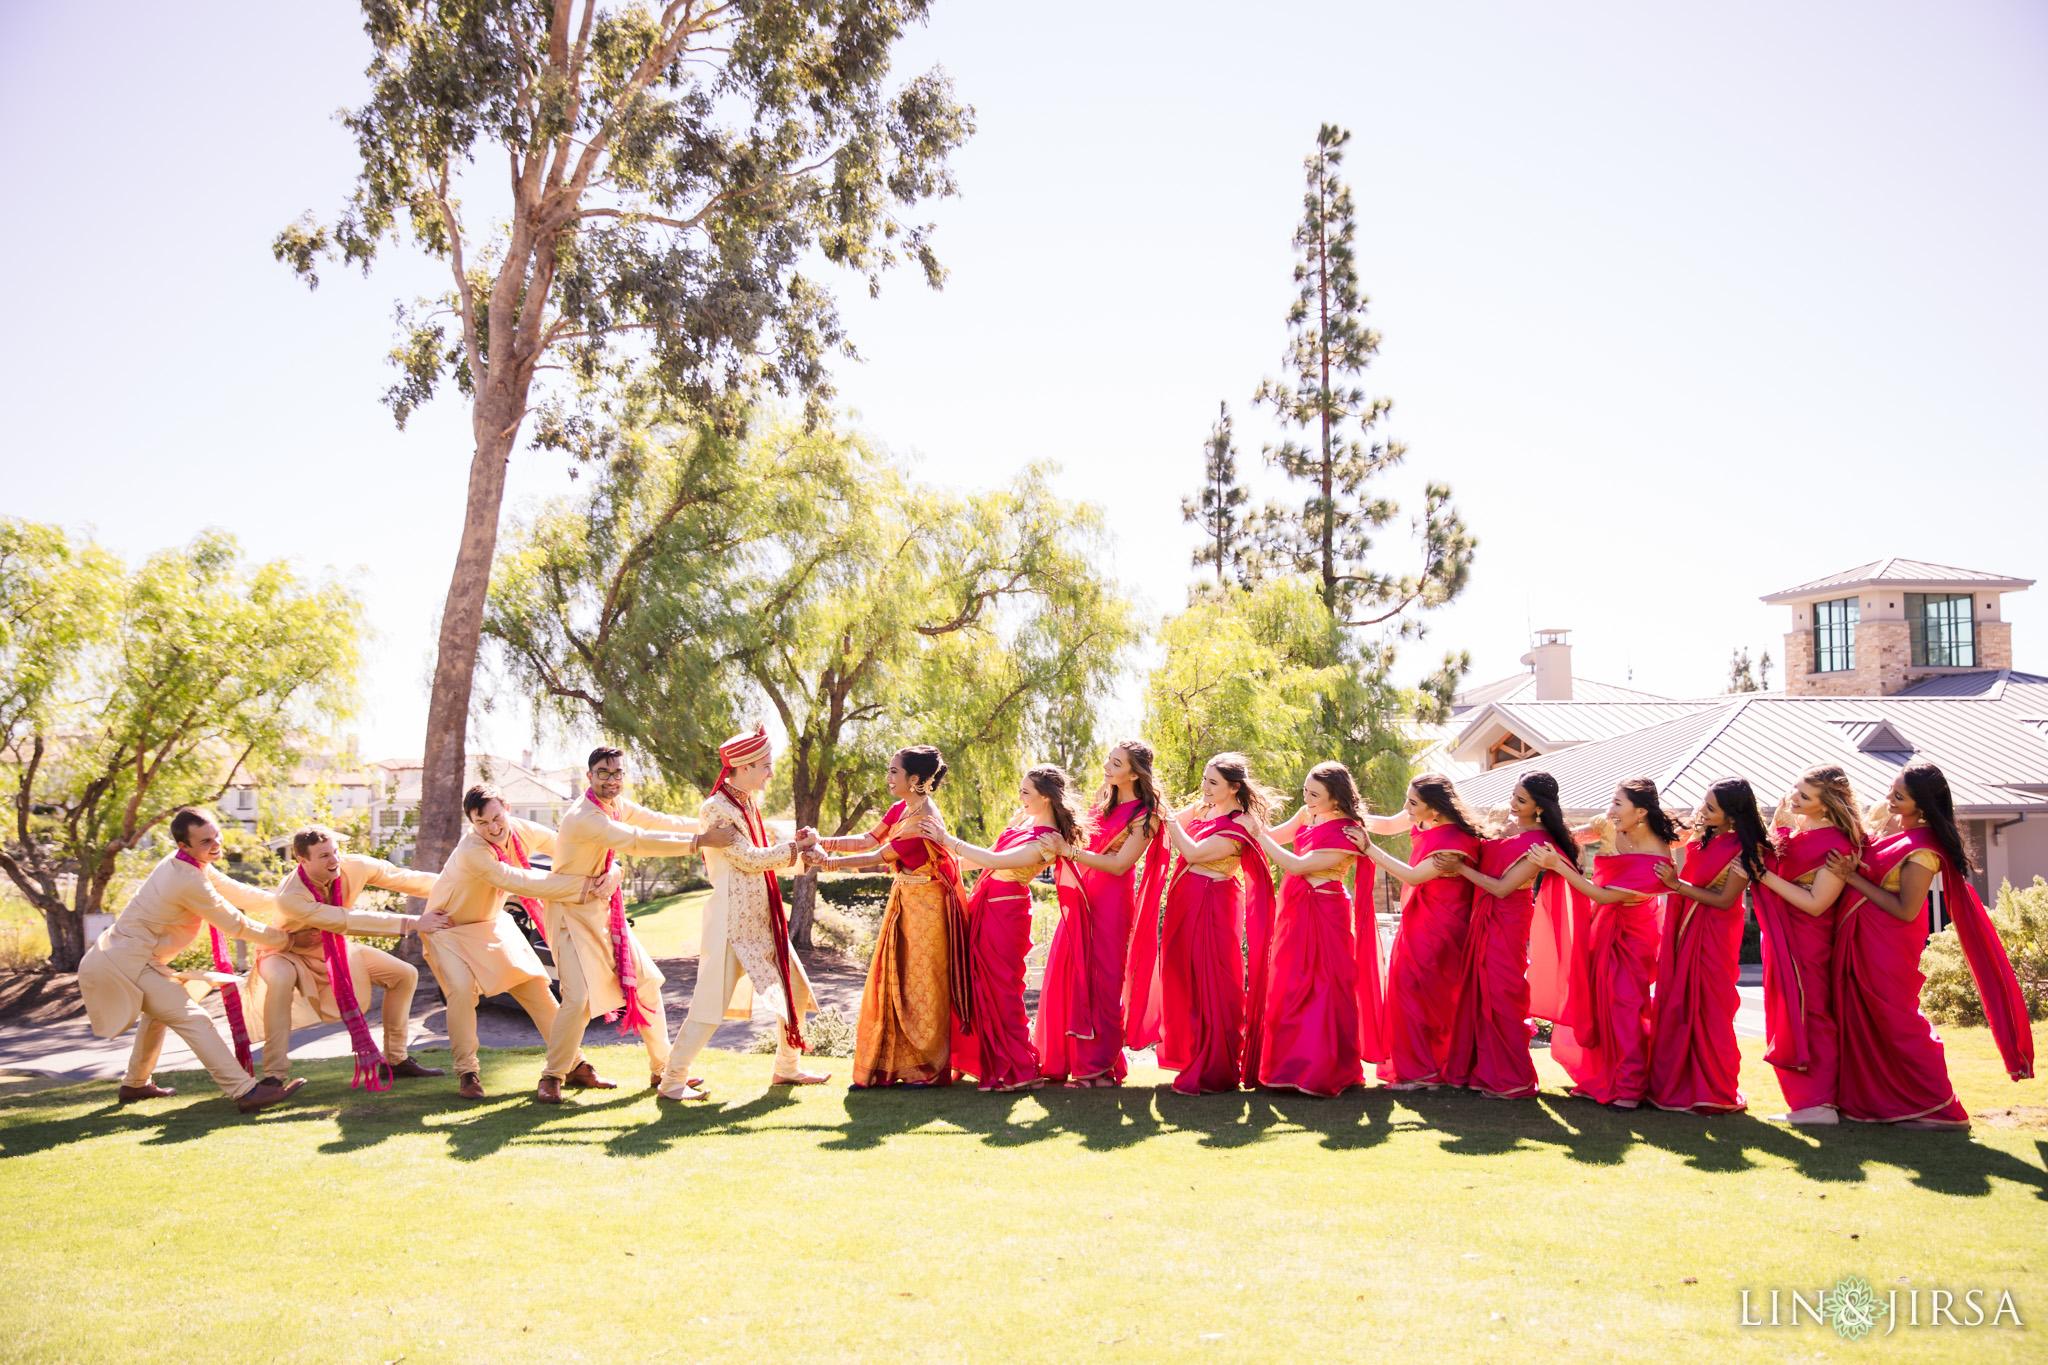 10 Black Gold Golf Course Yorba Linda Indian Wedding Photography